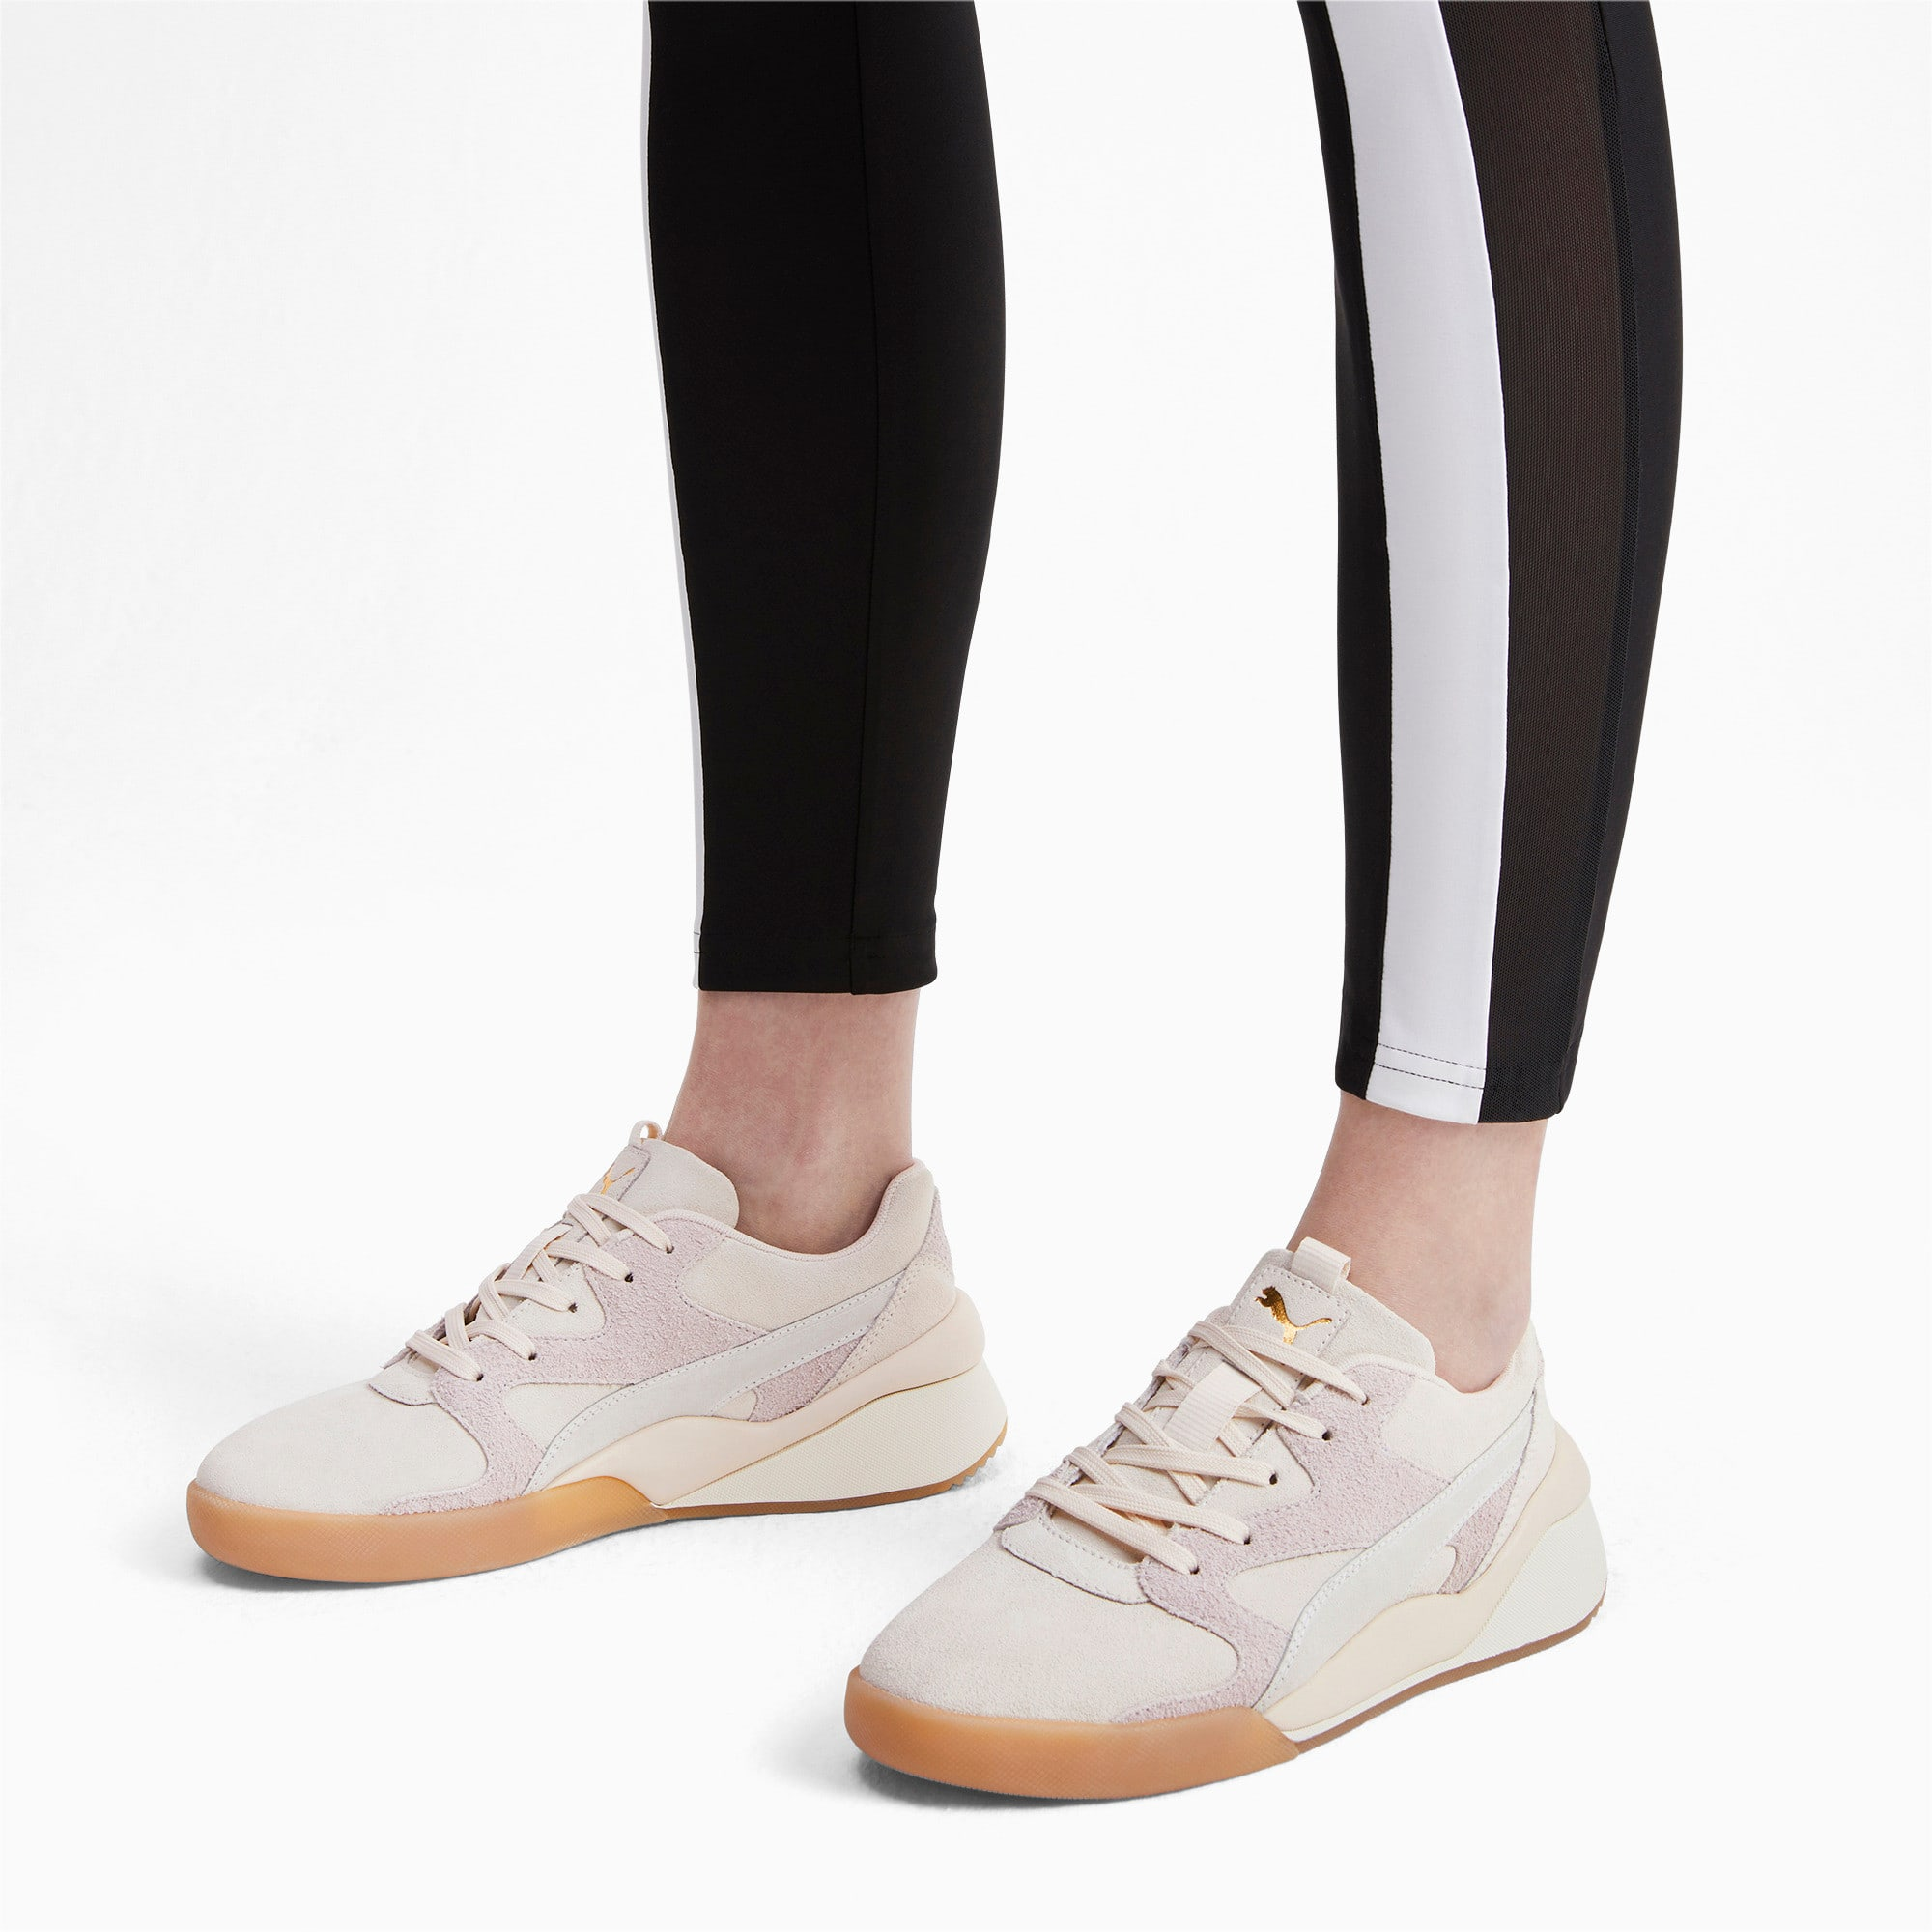 Thumbnail 2 of Aeon Rewind Women's Sneakers, Pastel Parchment, medium